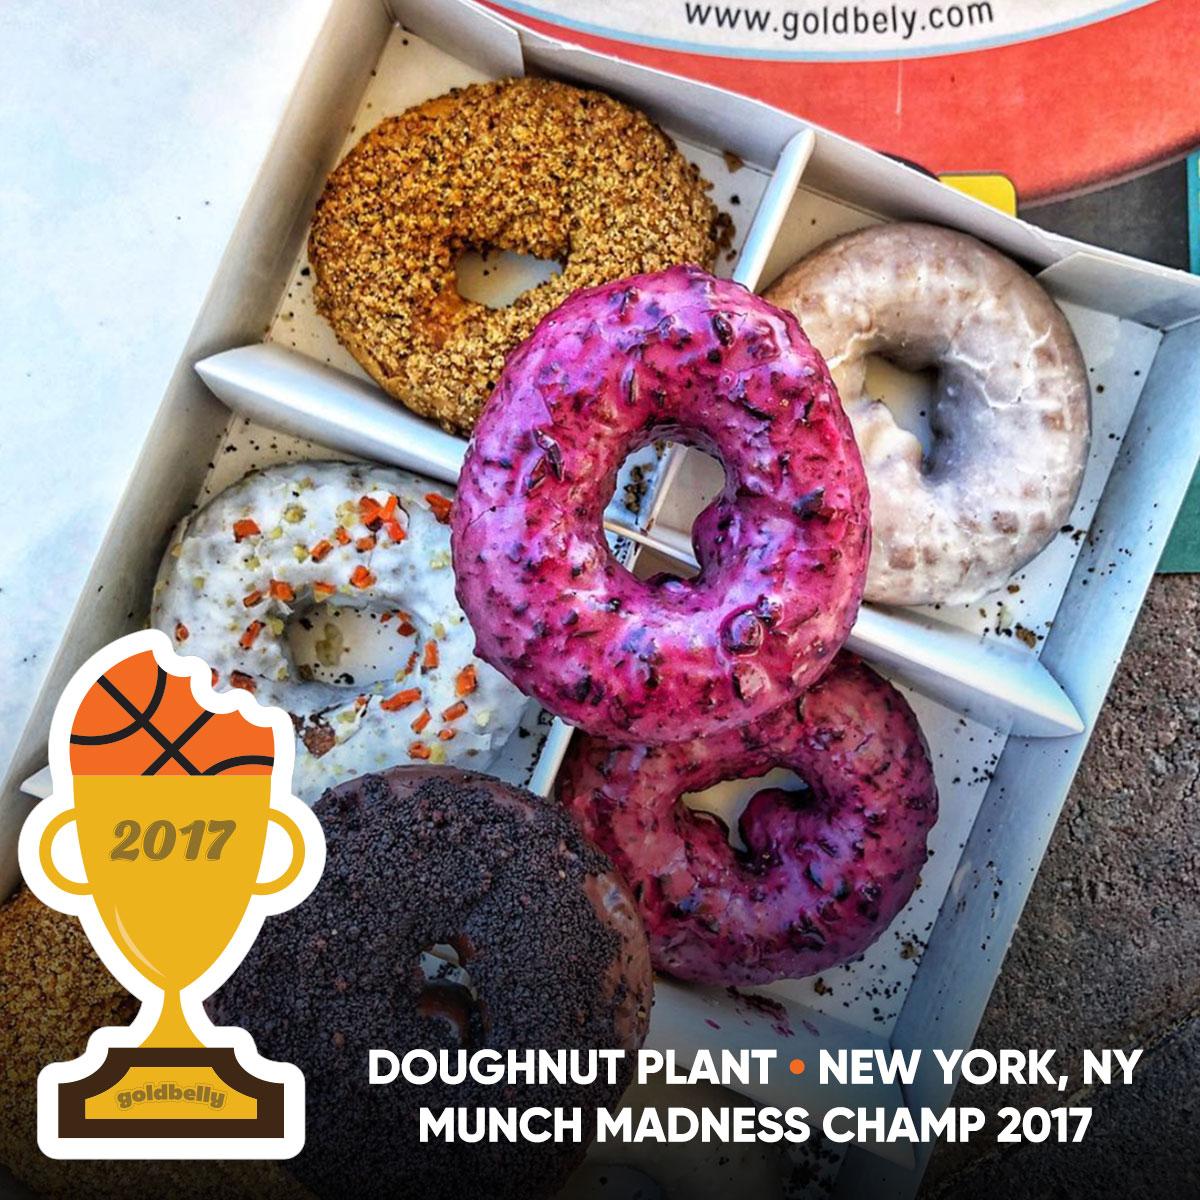 Past-Champs-Doughnut-Plant-V1-4.jpg